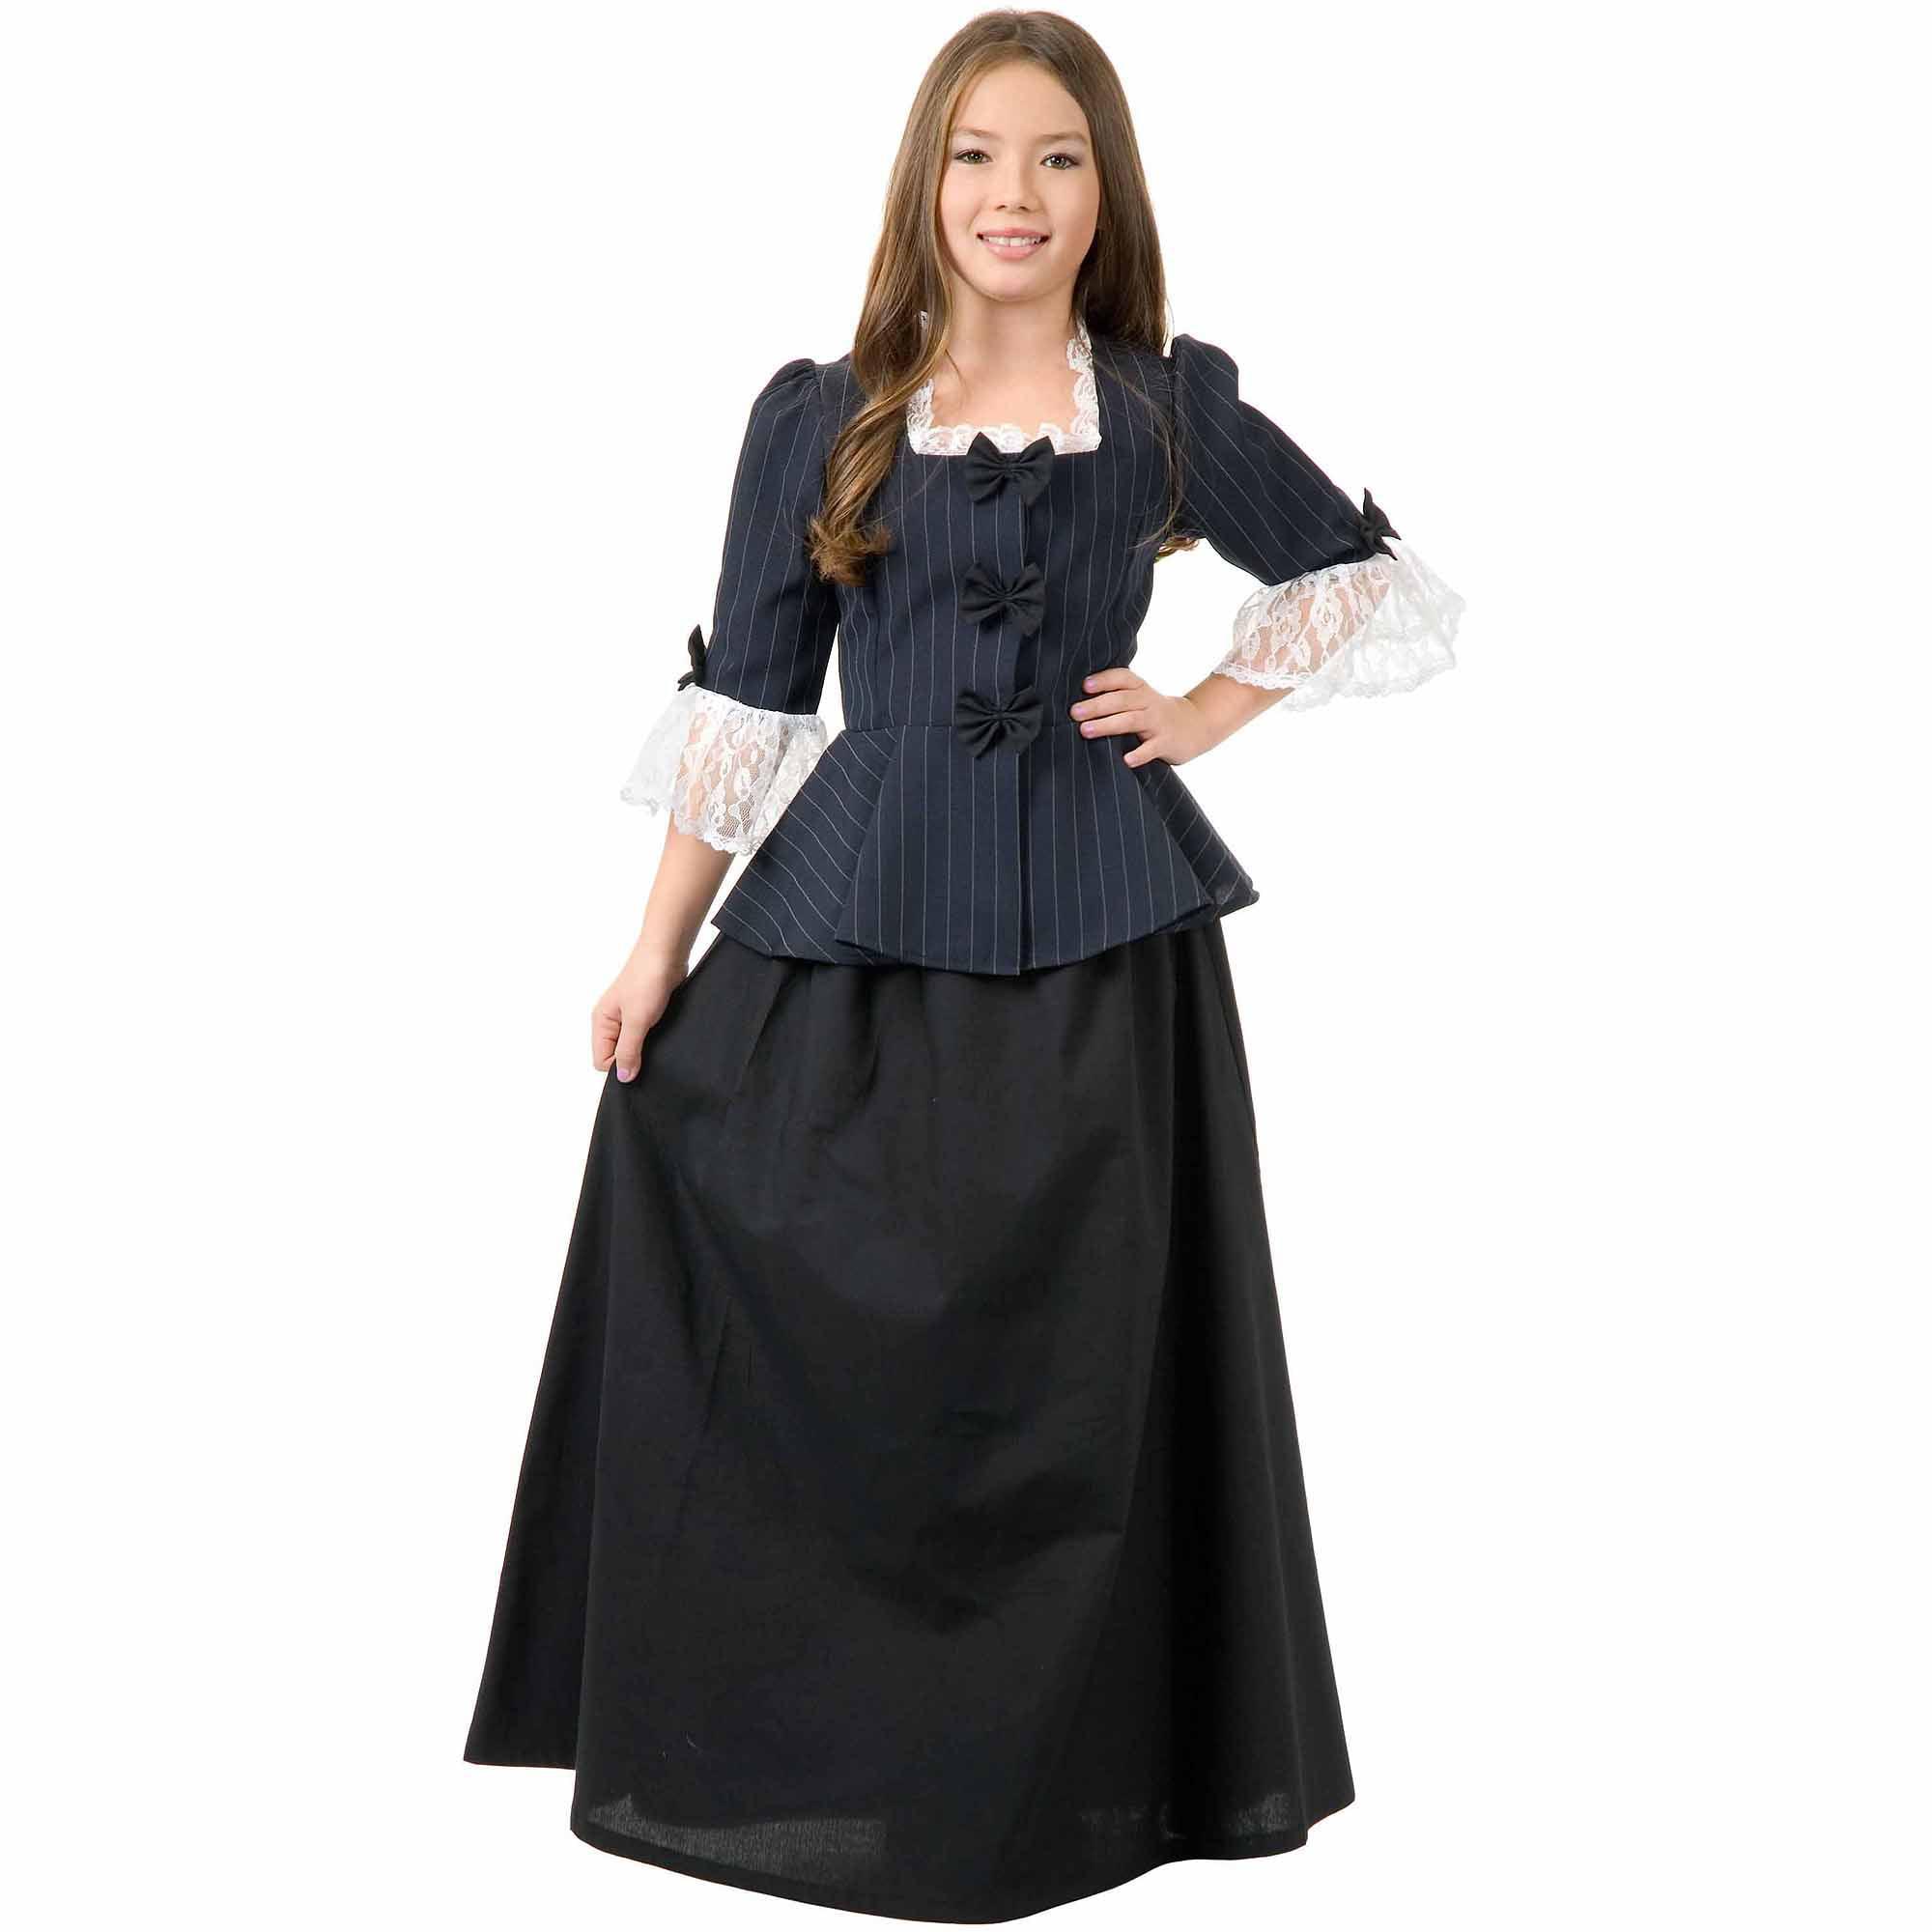 Colonial Girl Child Halloween Costume - Walmart.com